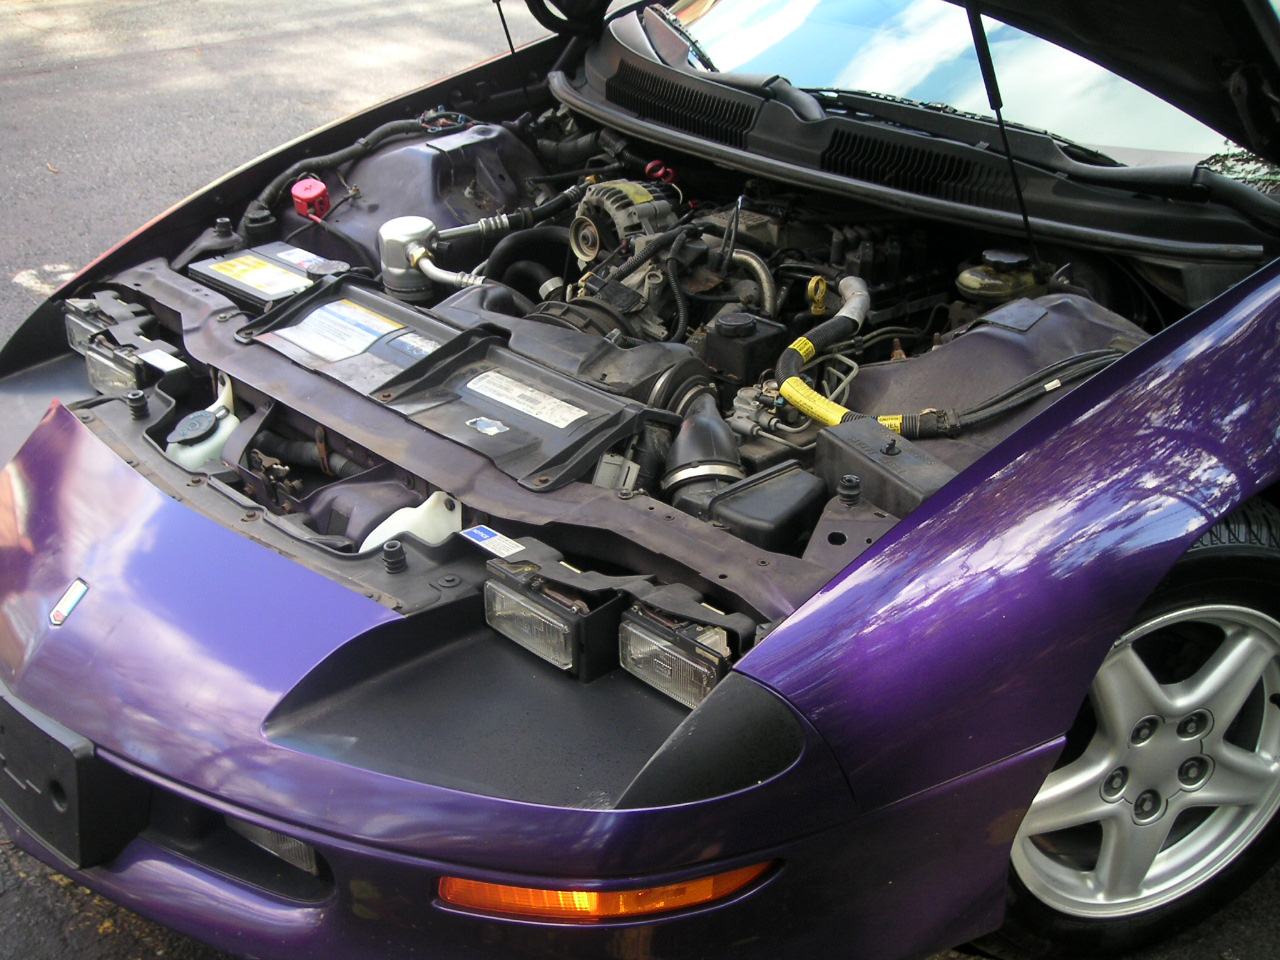 1997 To 1998 Bright Purple Metallic Camaro  Rs  Z28  Don U0026 39 T Quote Pics     - Ls1tech